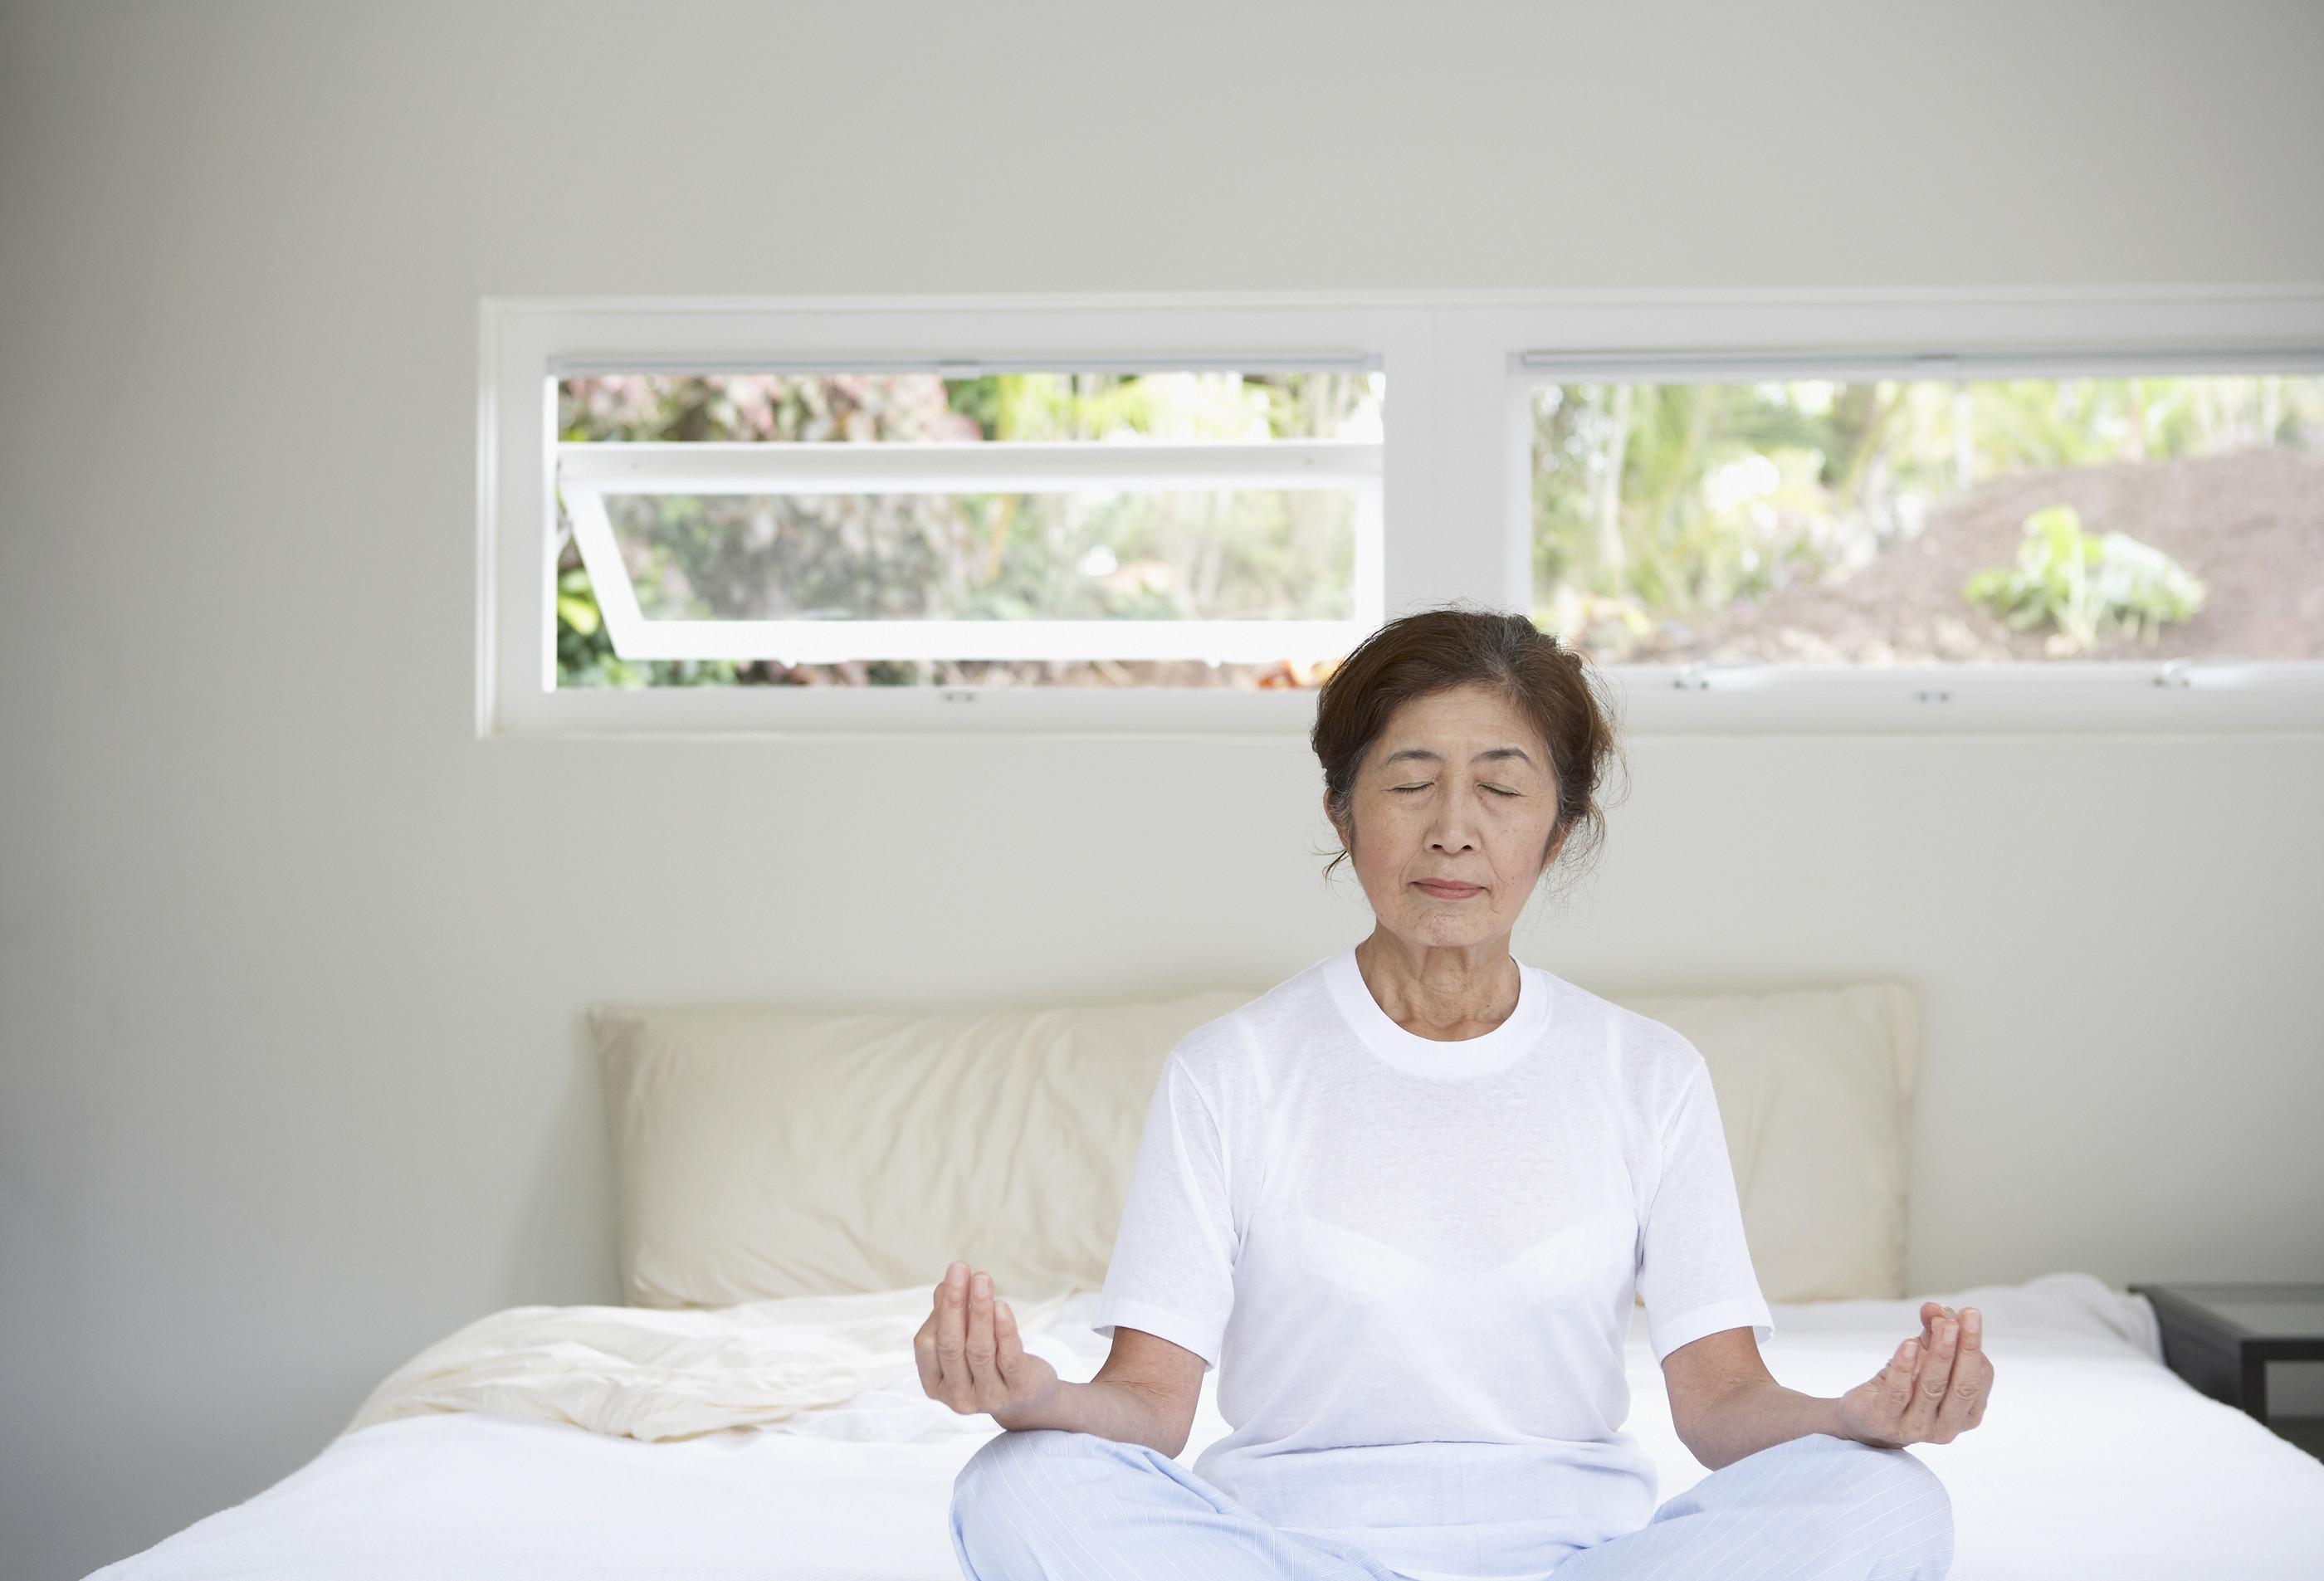 bigstock-Senior-Asian-woman-meditating-73164502